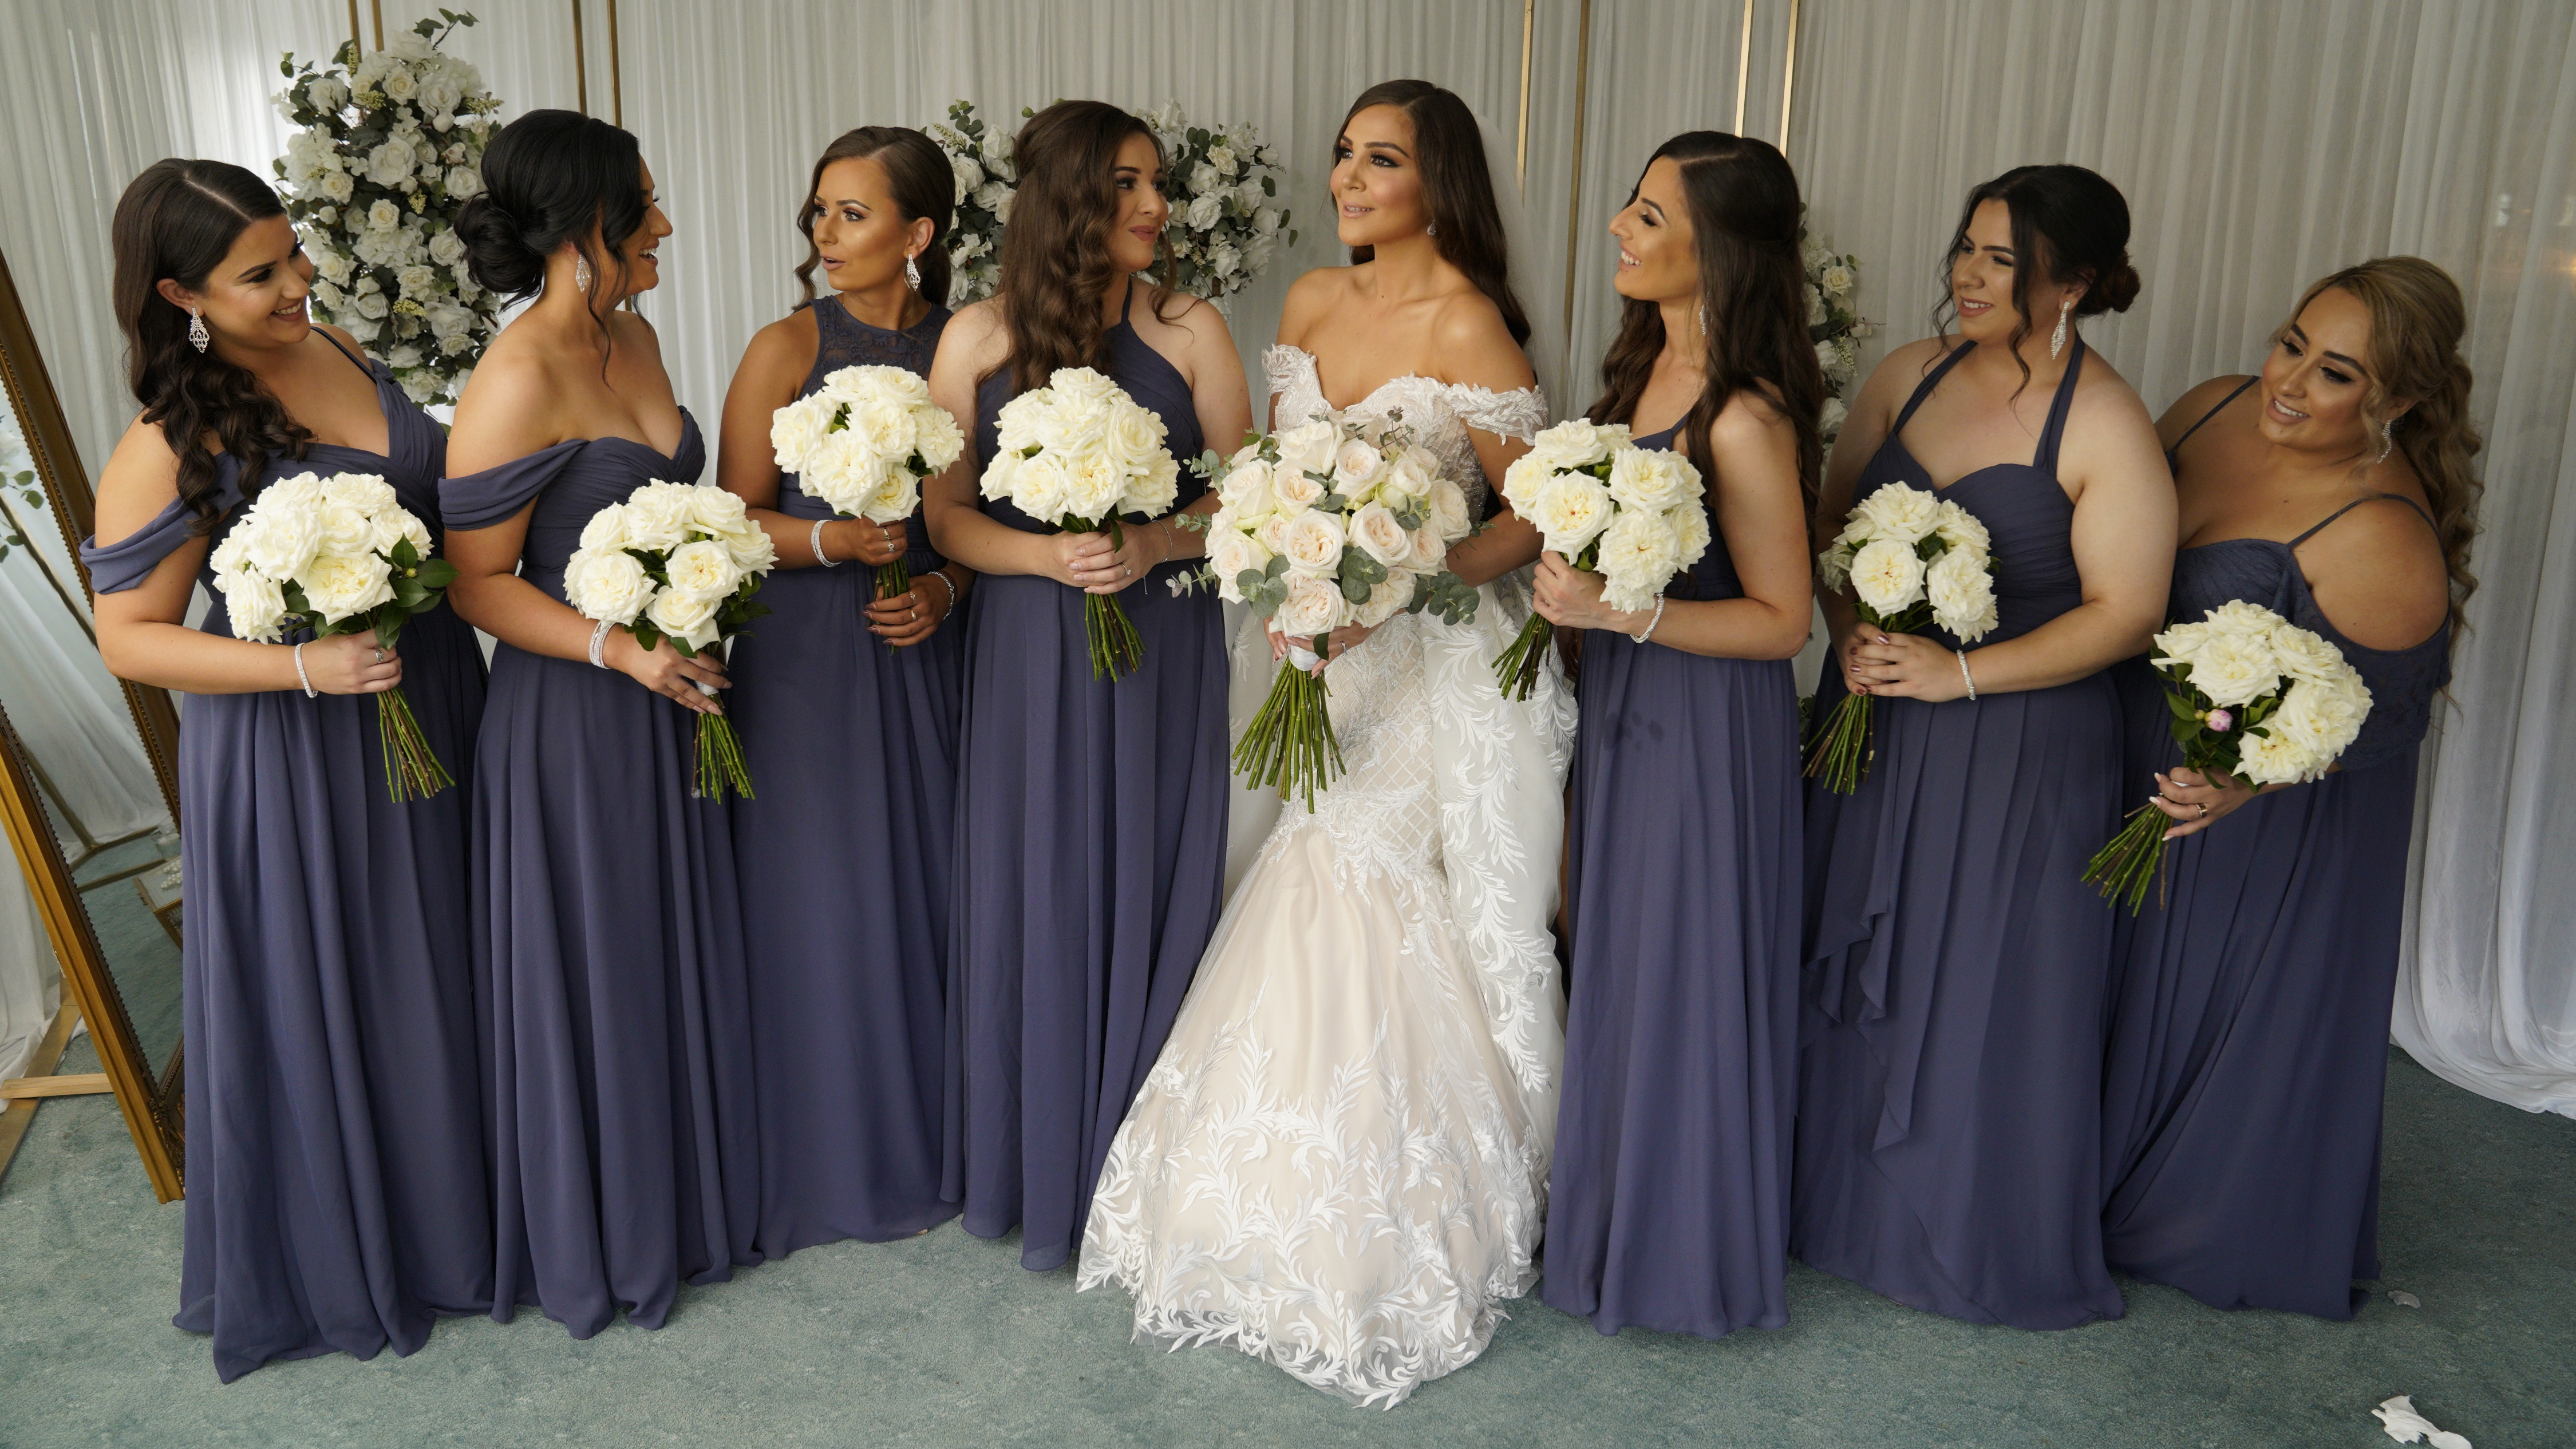 jjshouse reviews wedding dress cheap online